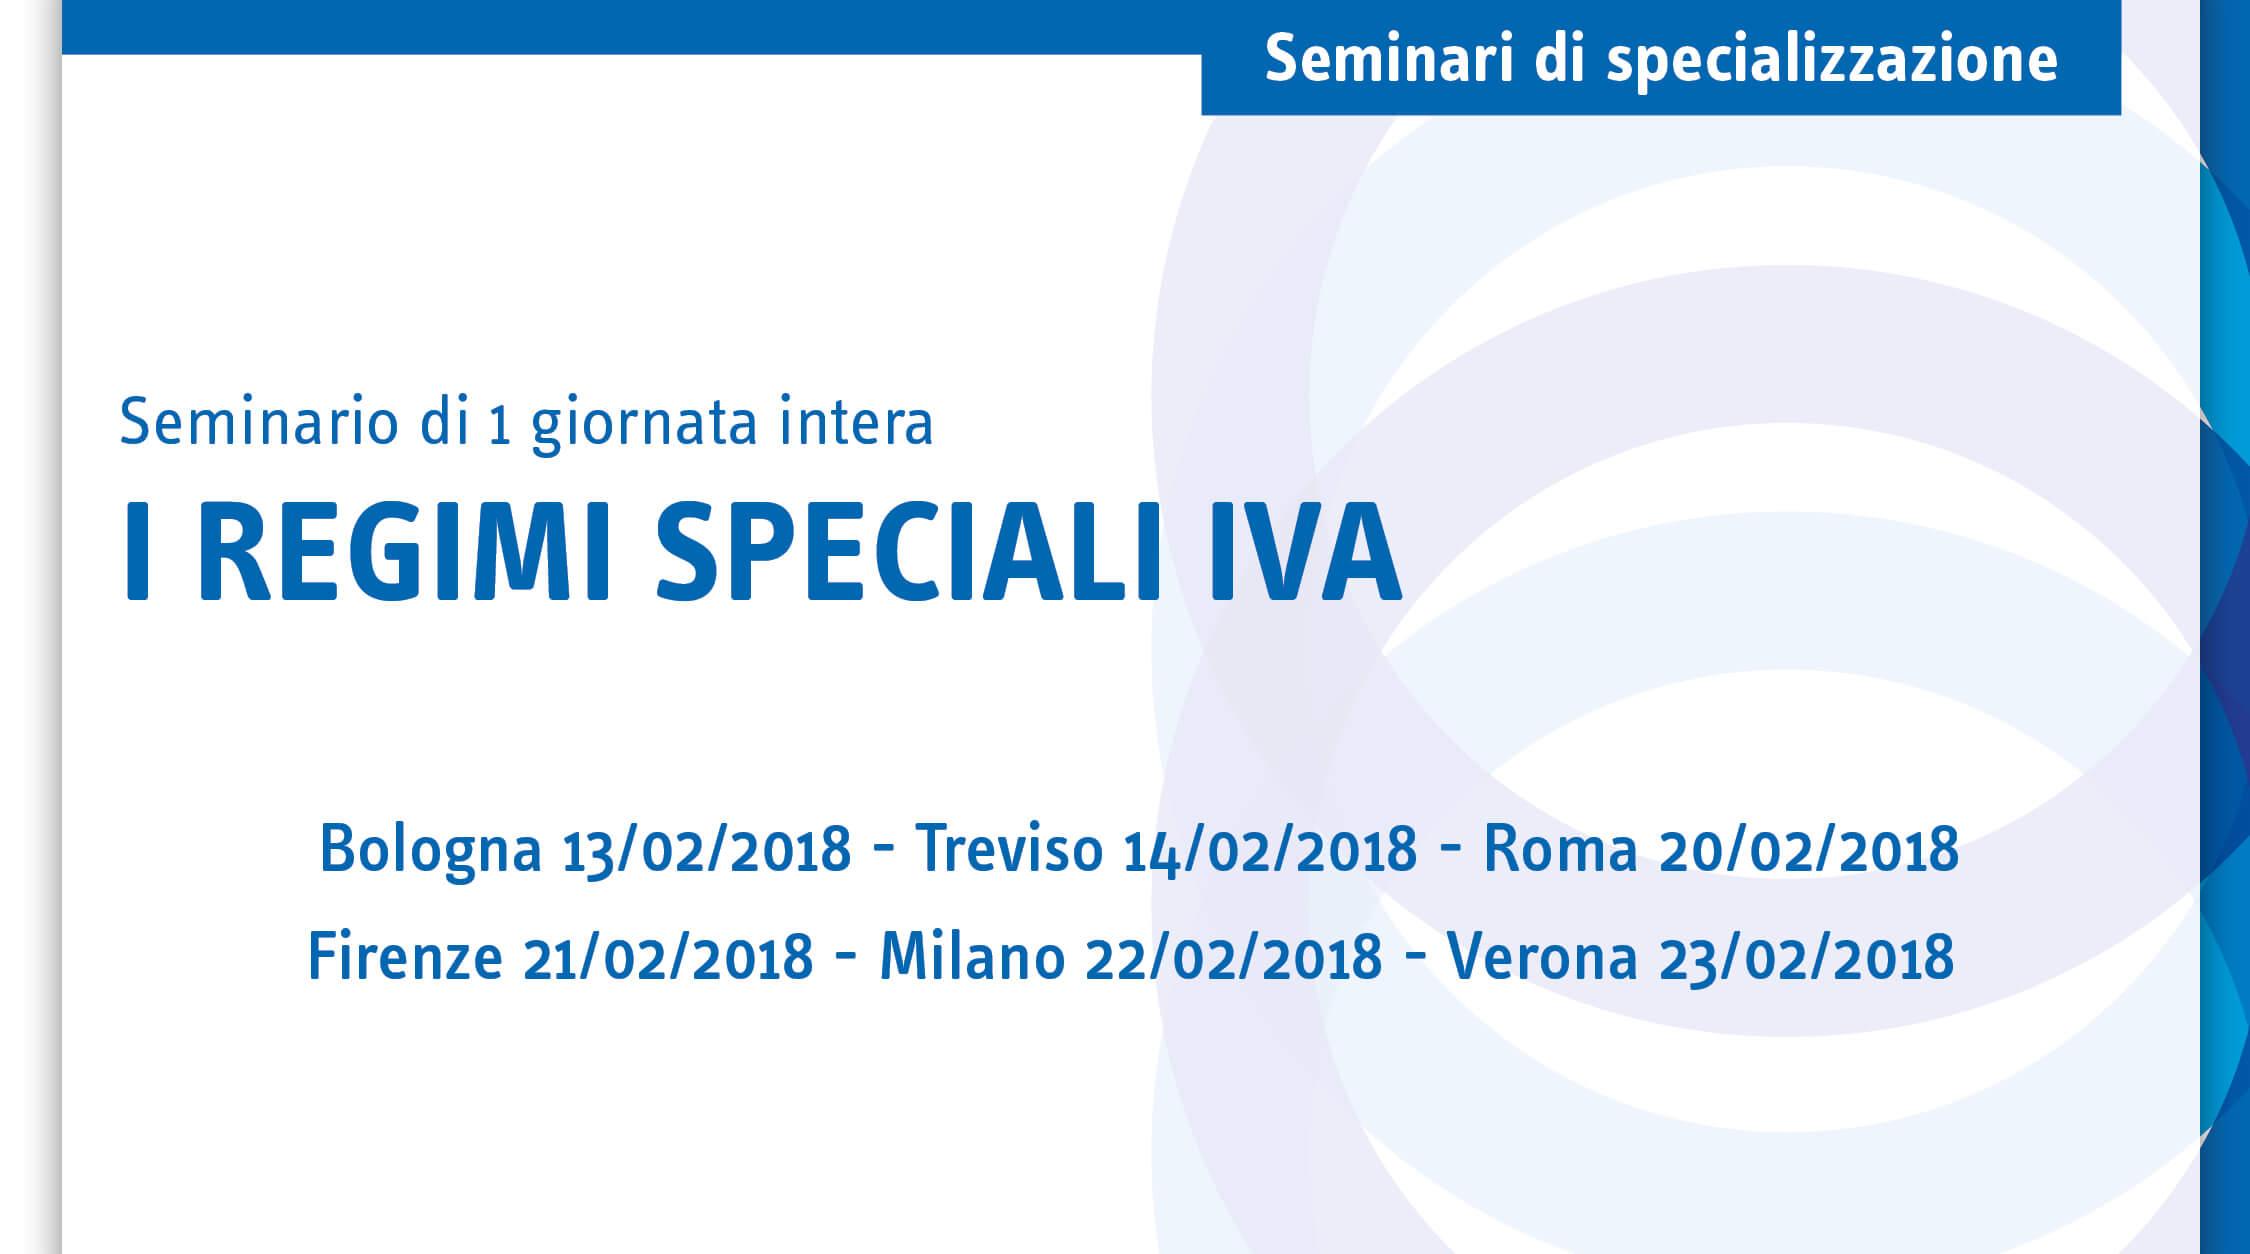 I regimi speciali IVA